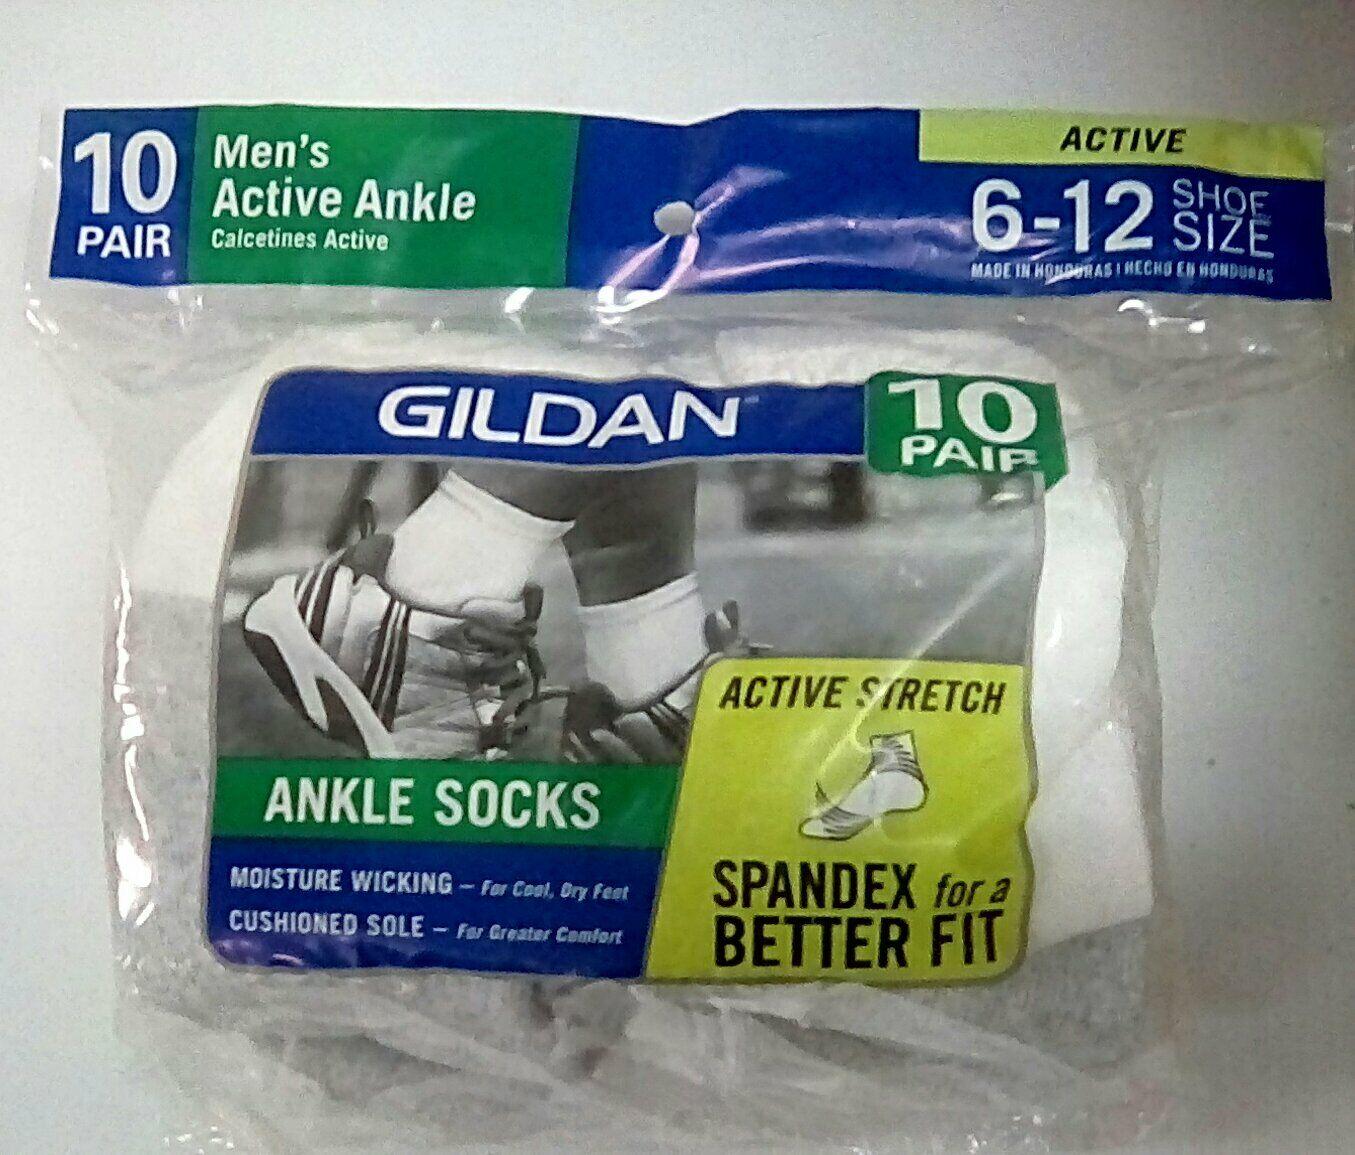 GILDAN MEN'S ANKLE SOCK, ACTIVE STRETCH, WHITE, LARGE, 10 PA